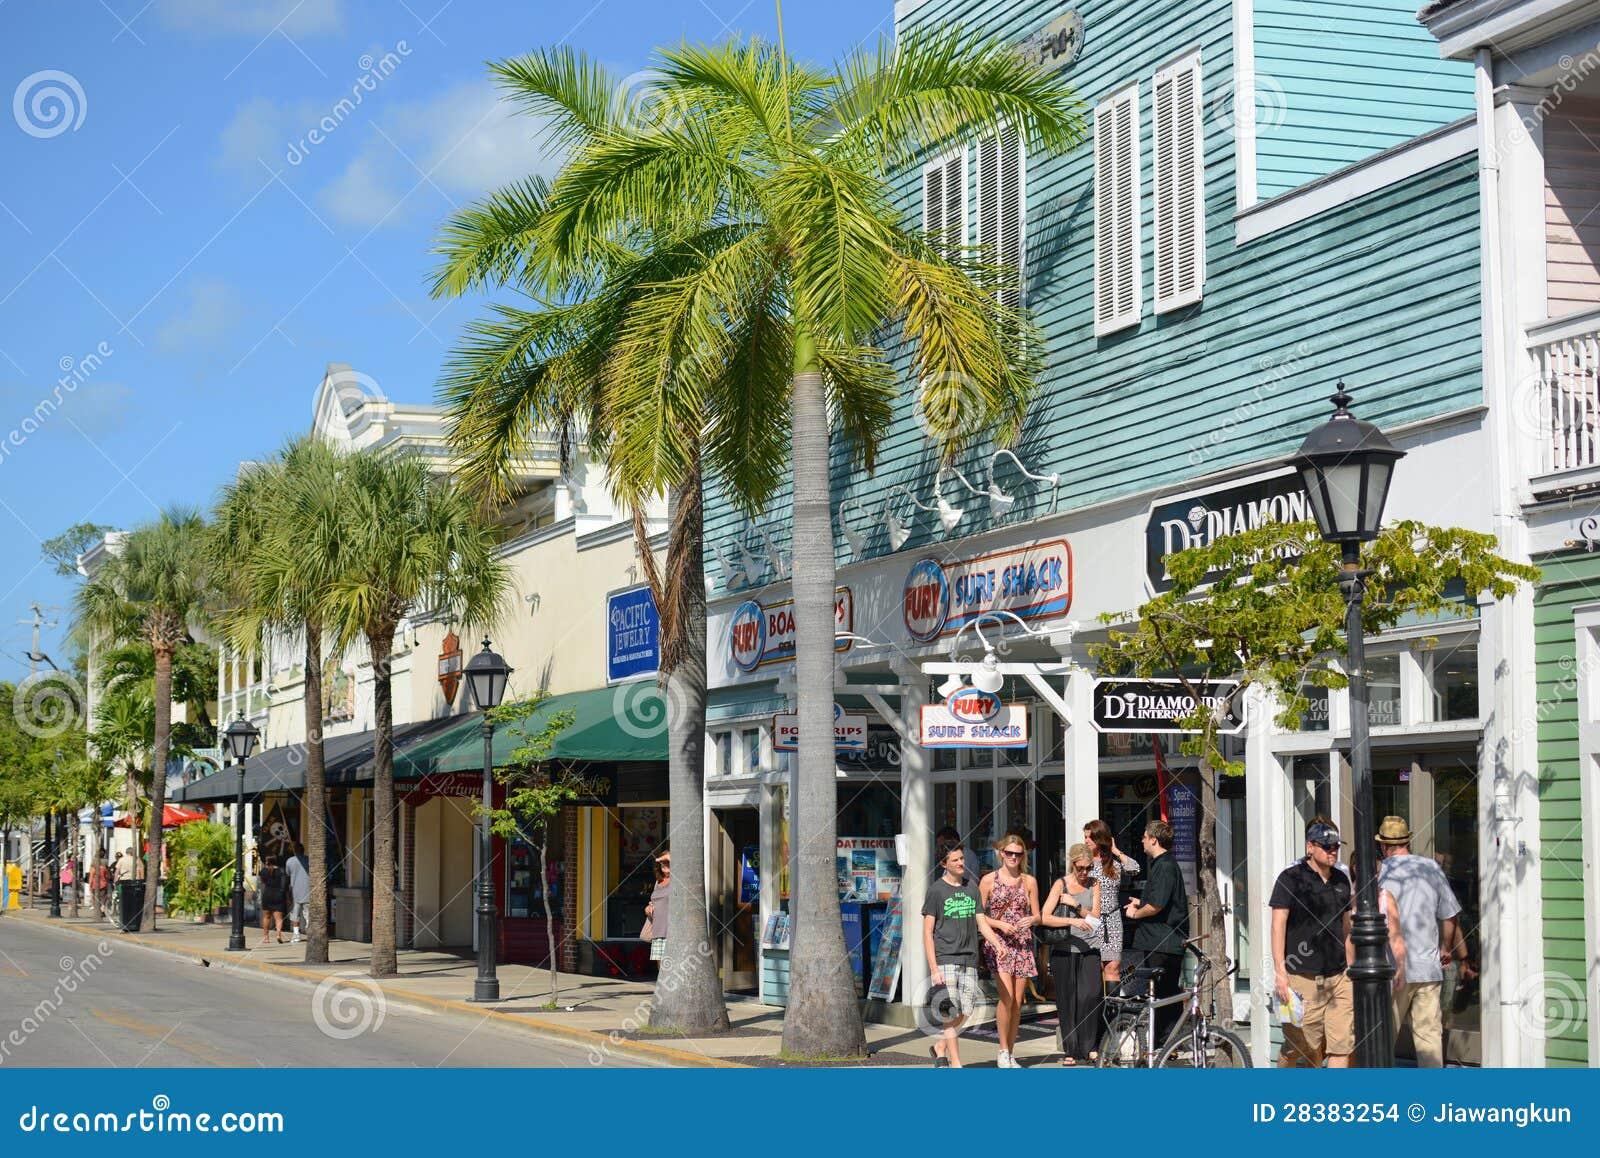 Key West House Plans